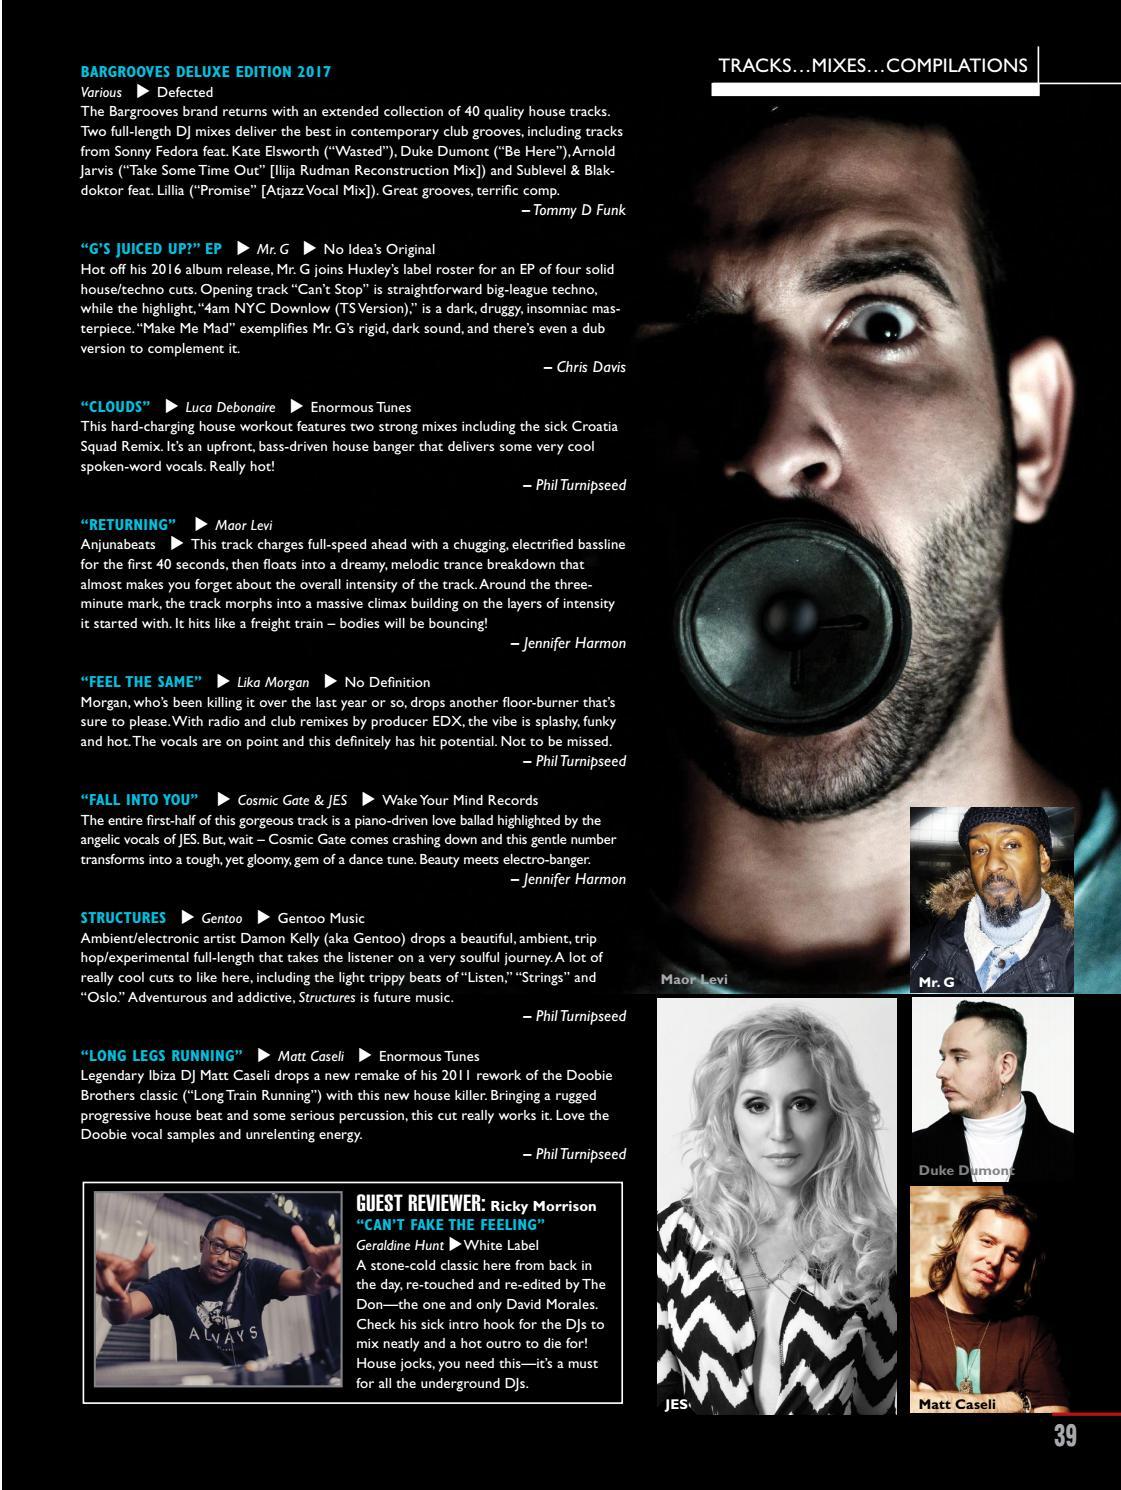 DJ Times February 2017, Vol 30 No 2 by DJ Times Magazine - issuu